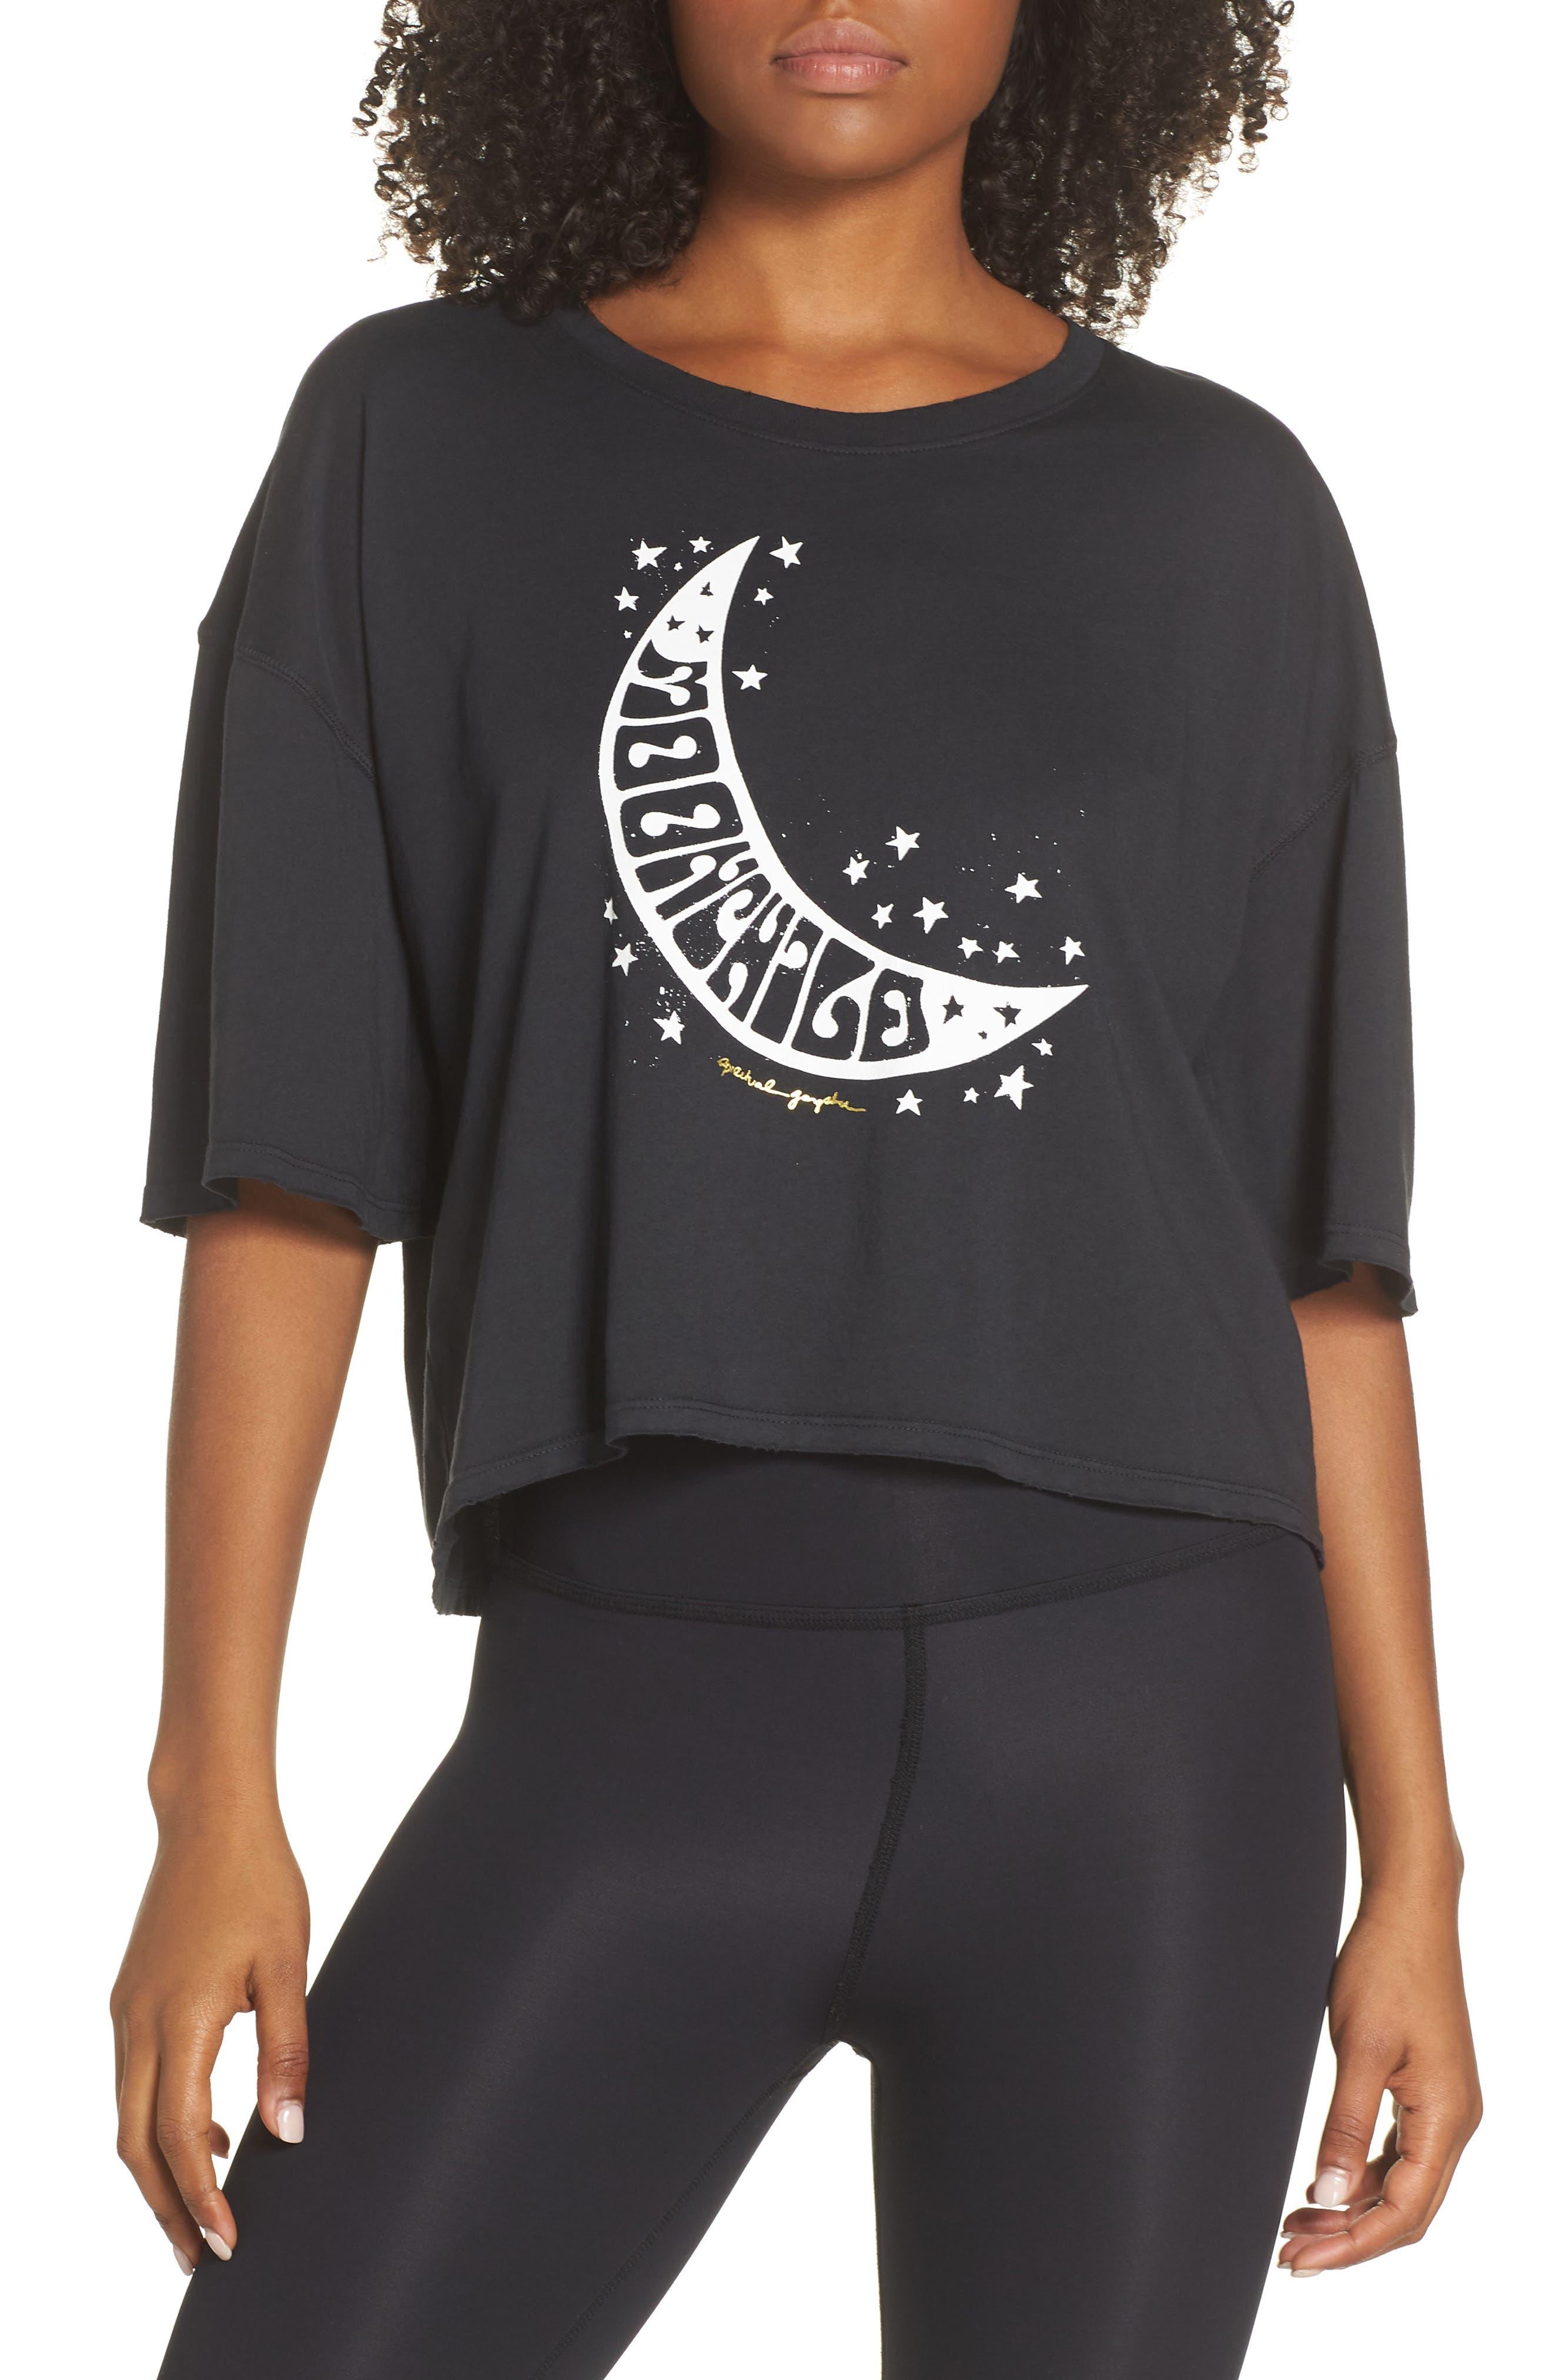 Spiritual Gangster Moonchild Graphic Tee, Black